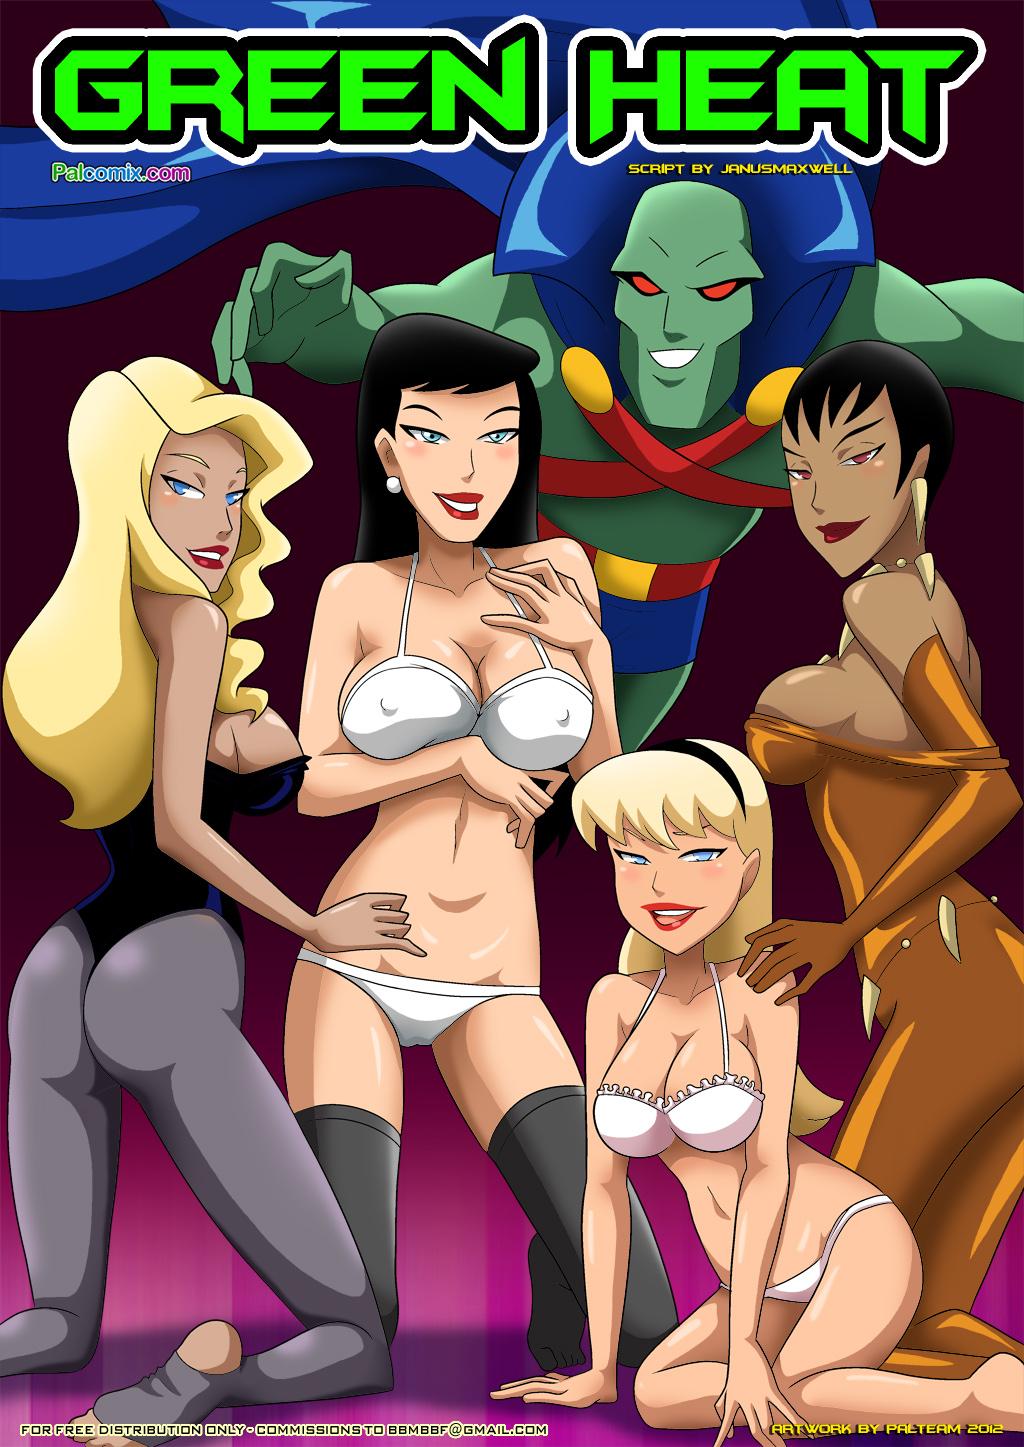 Goodcomix Justice League - [Palcomix] - Green Heat